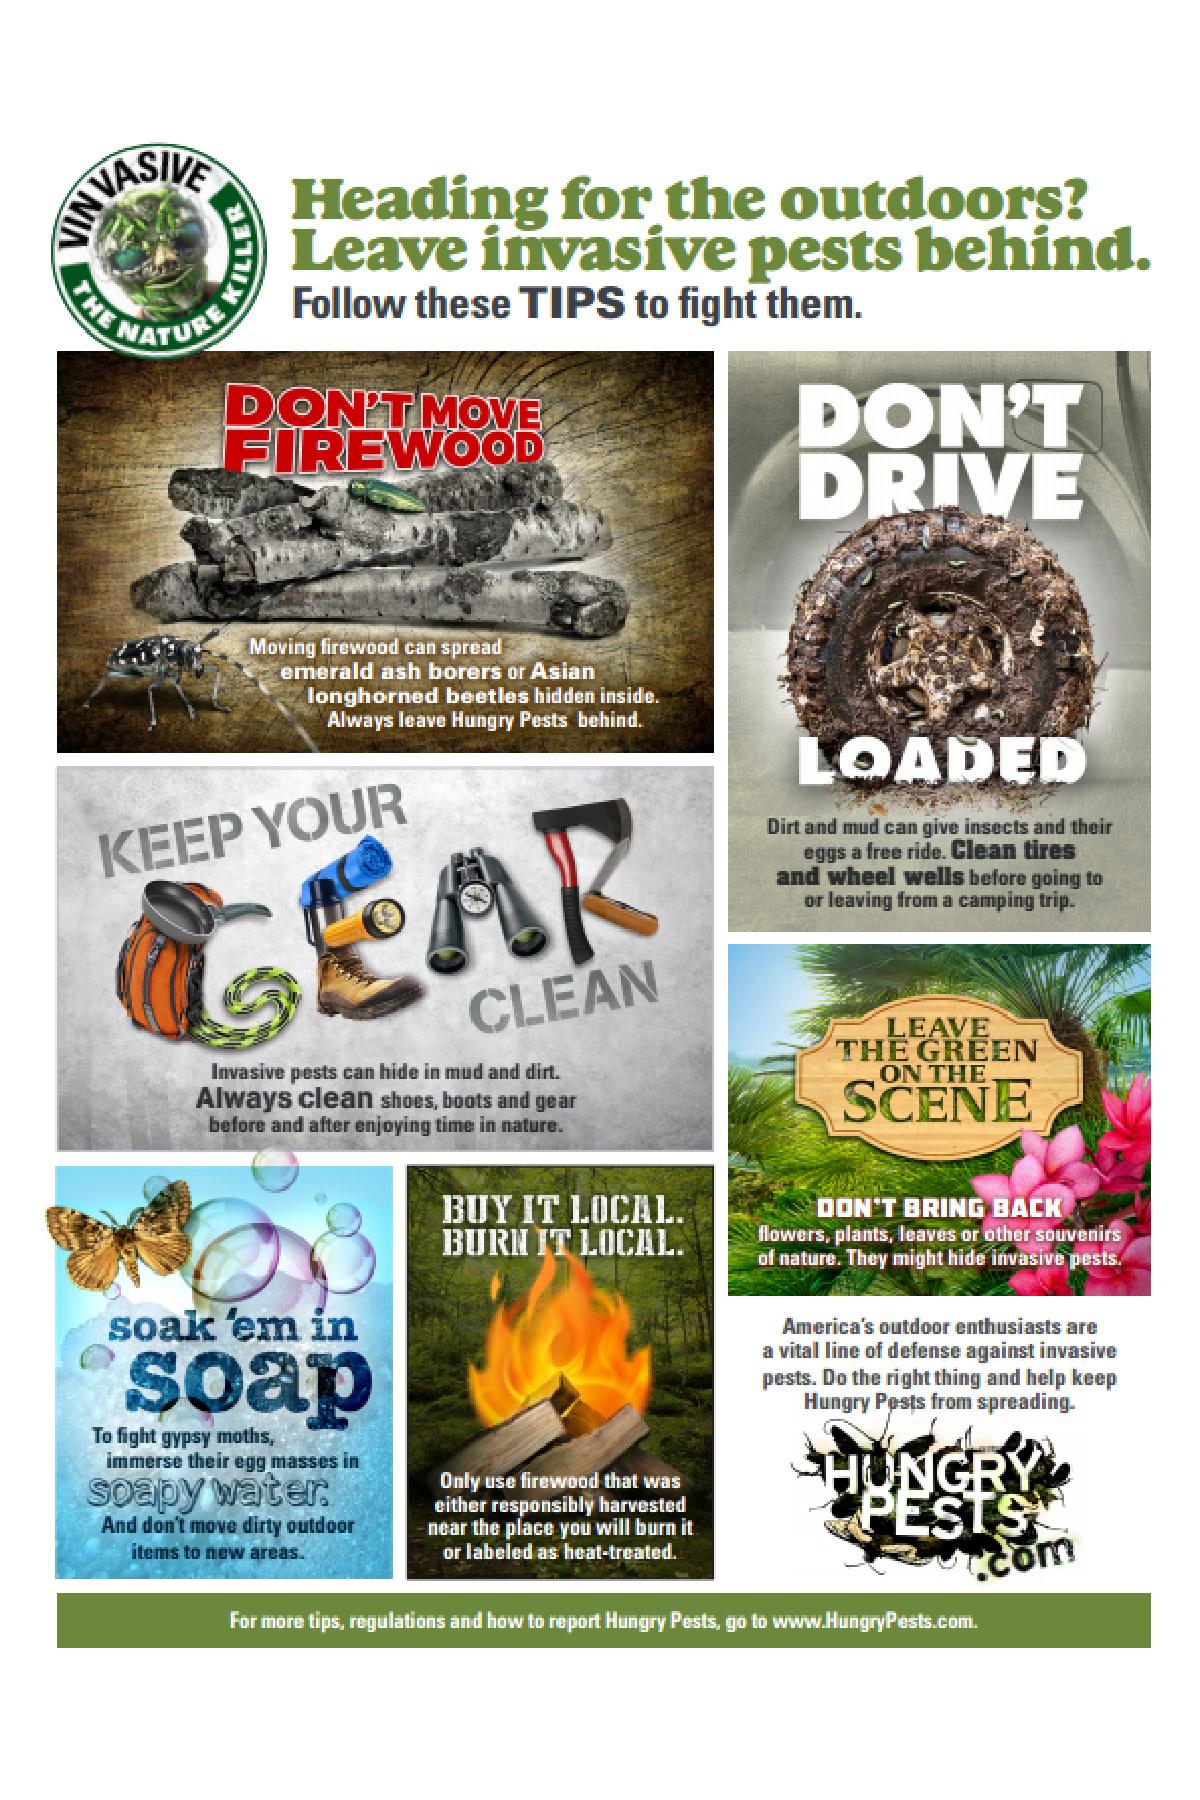 USDA Invasive Pests infographic